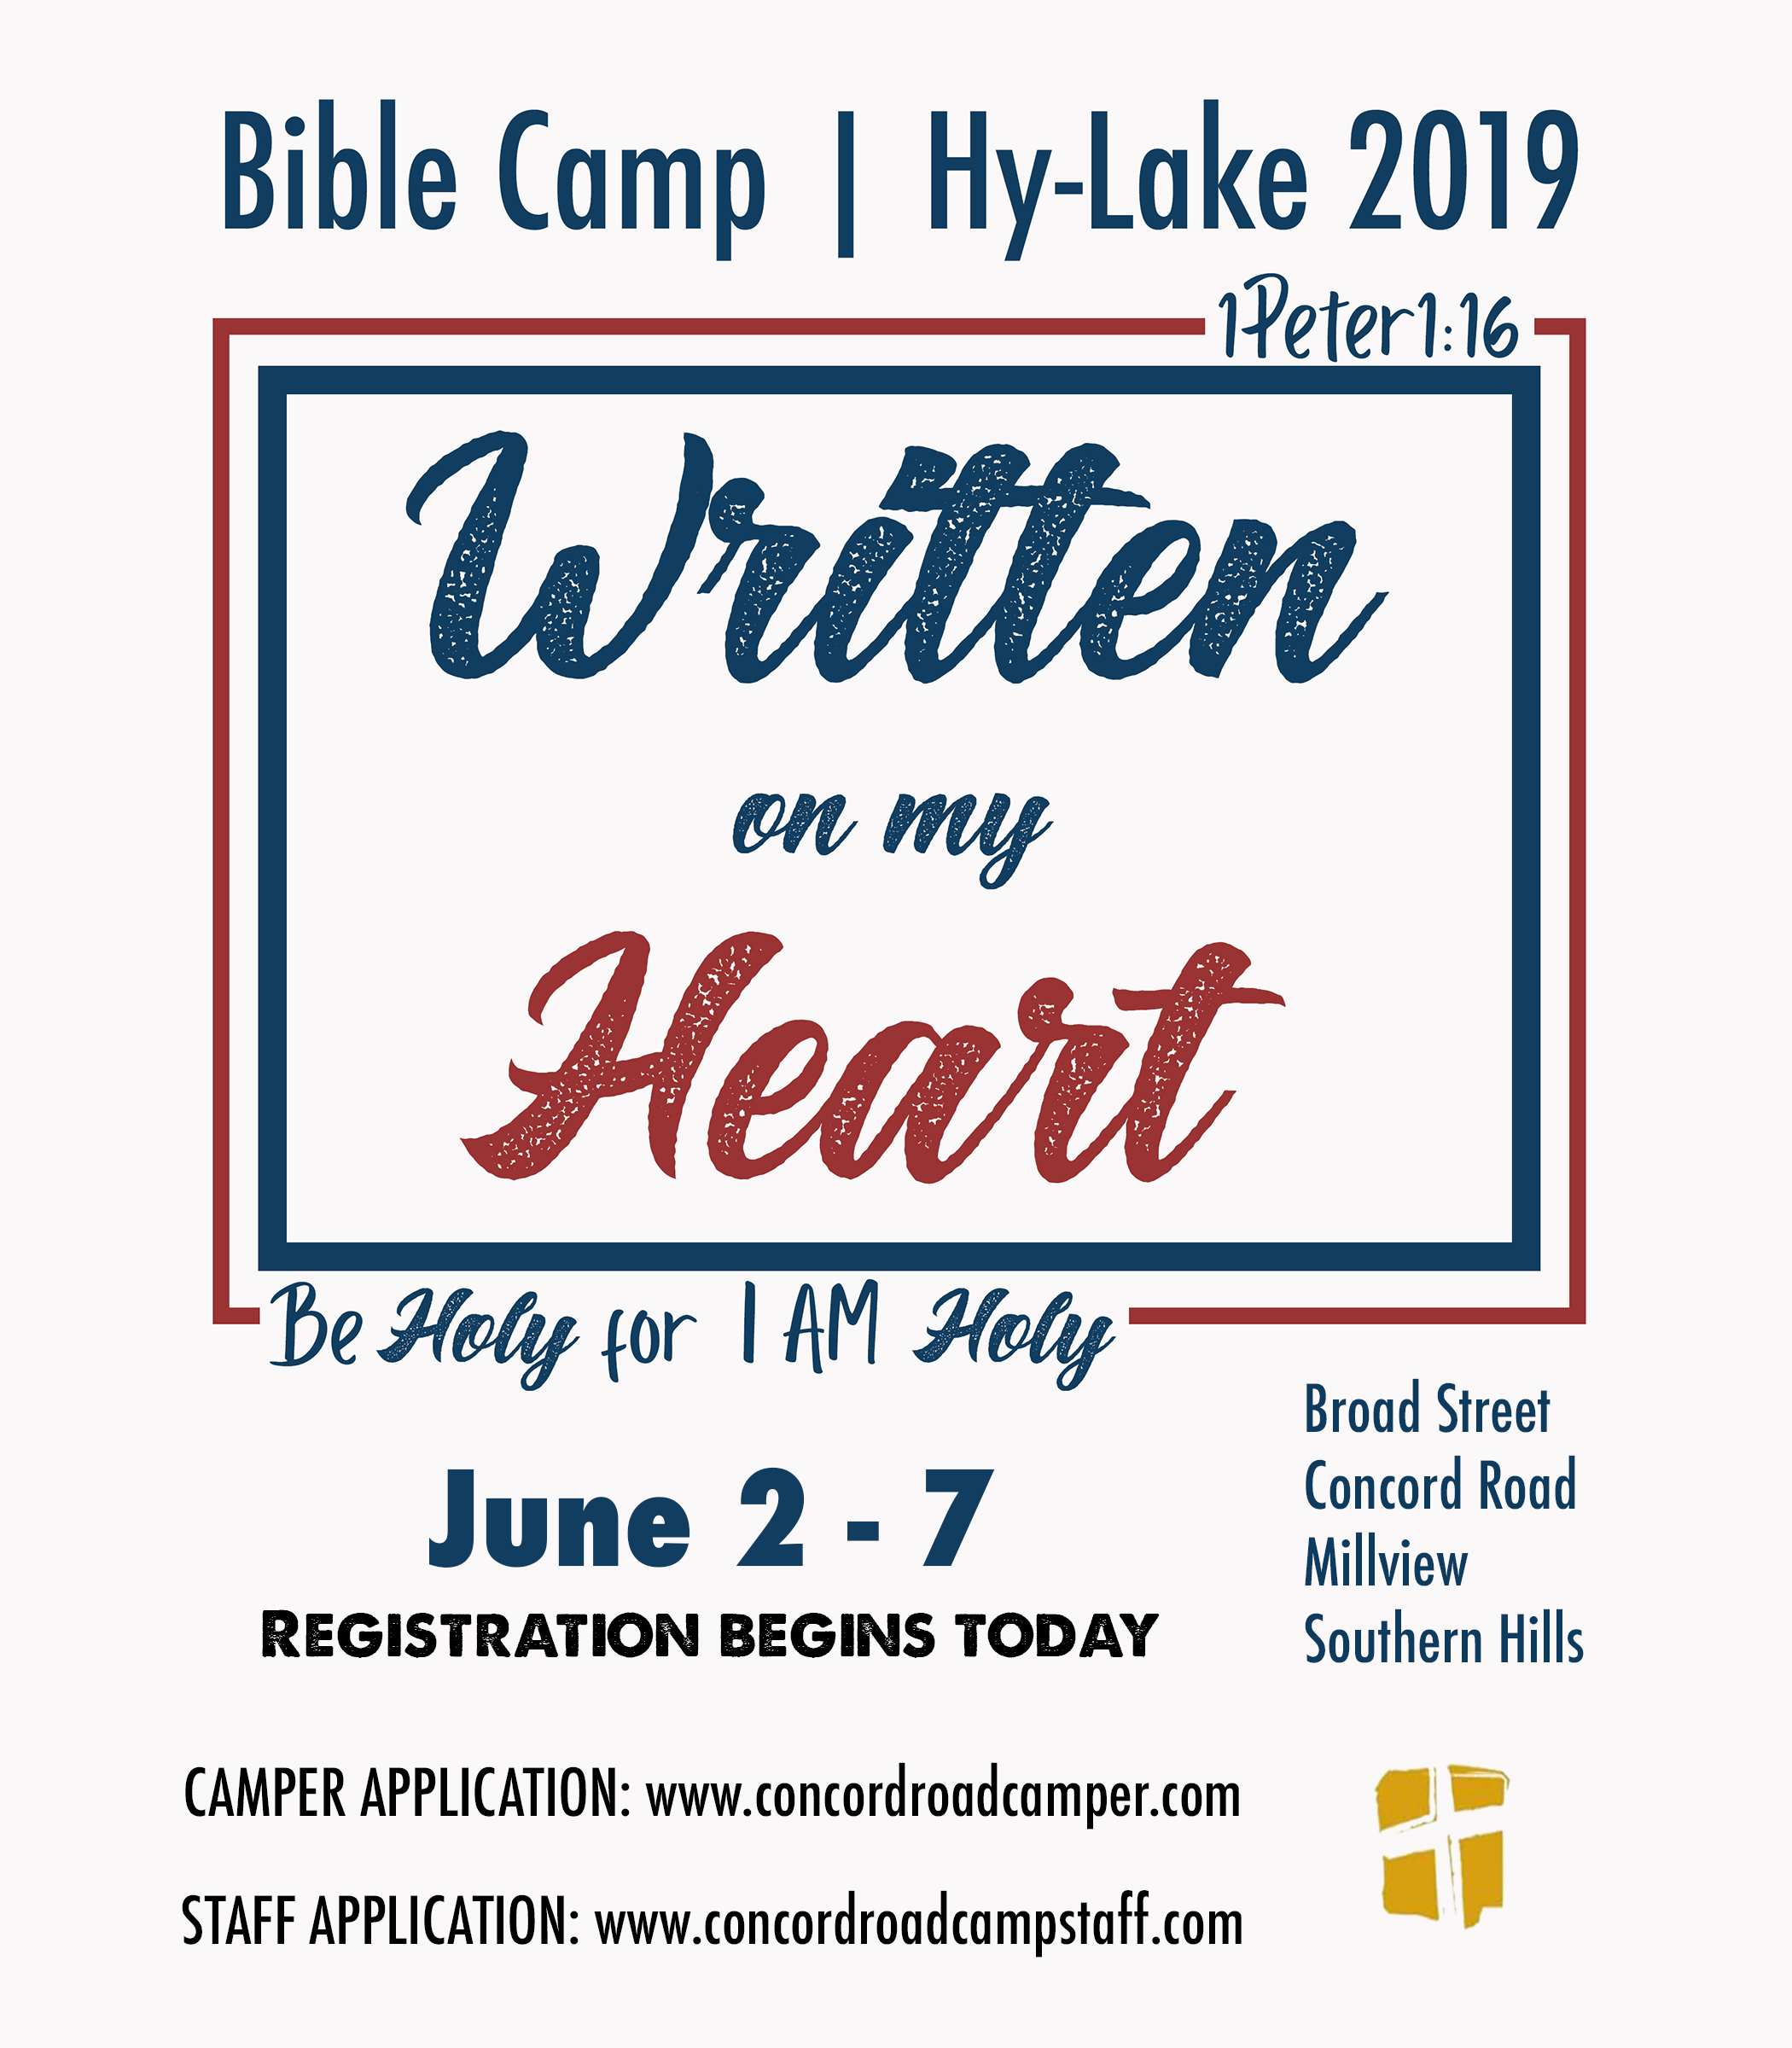 Bible-Camp-Brentwood-Nashville-church-of-Christ